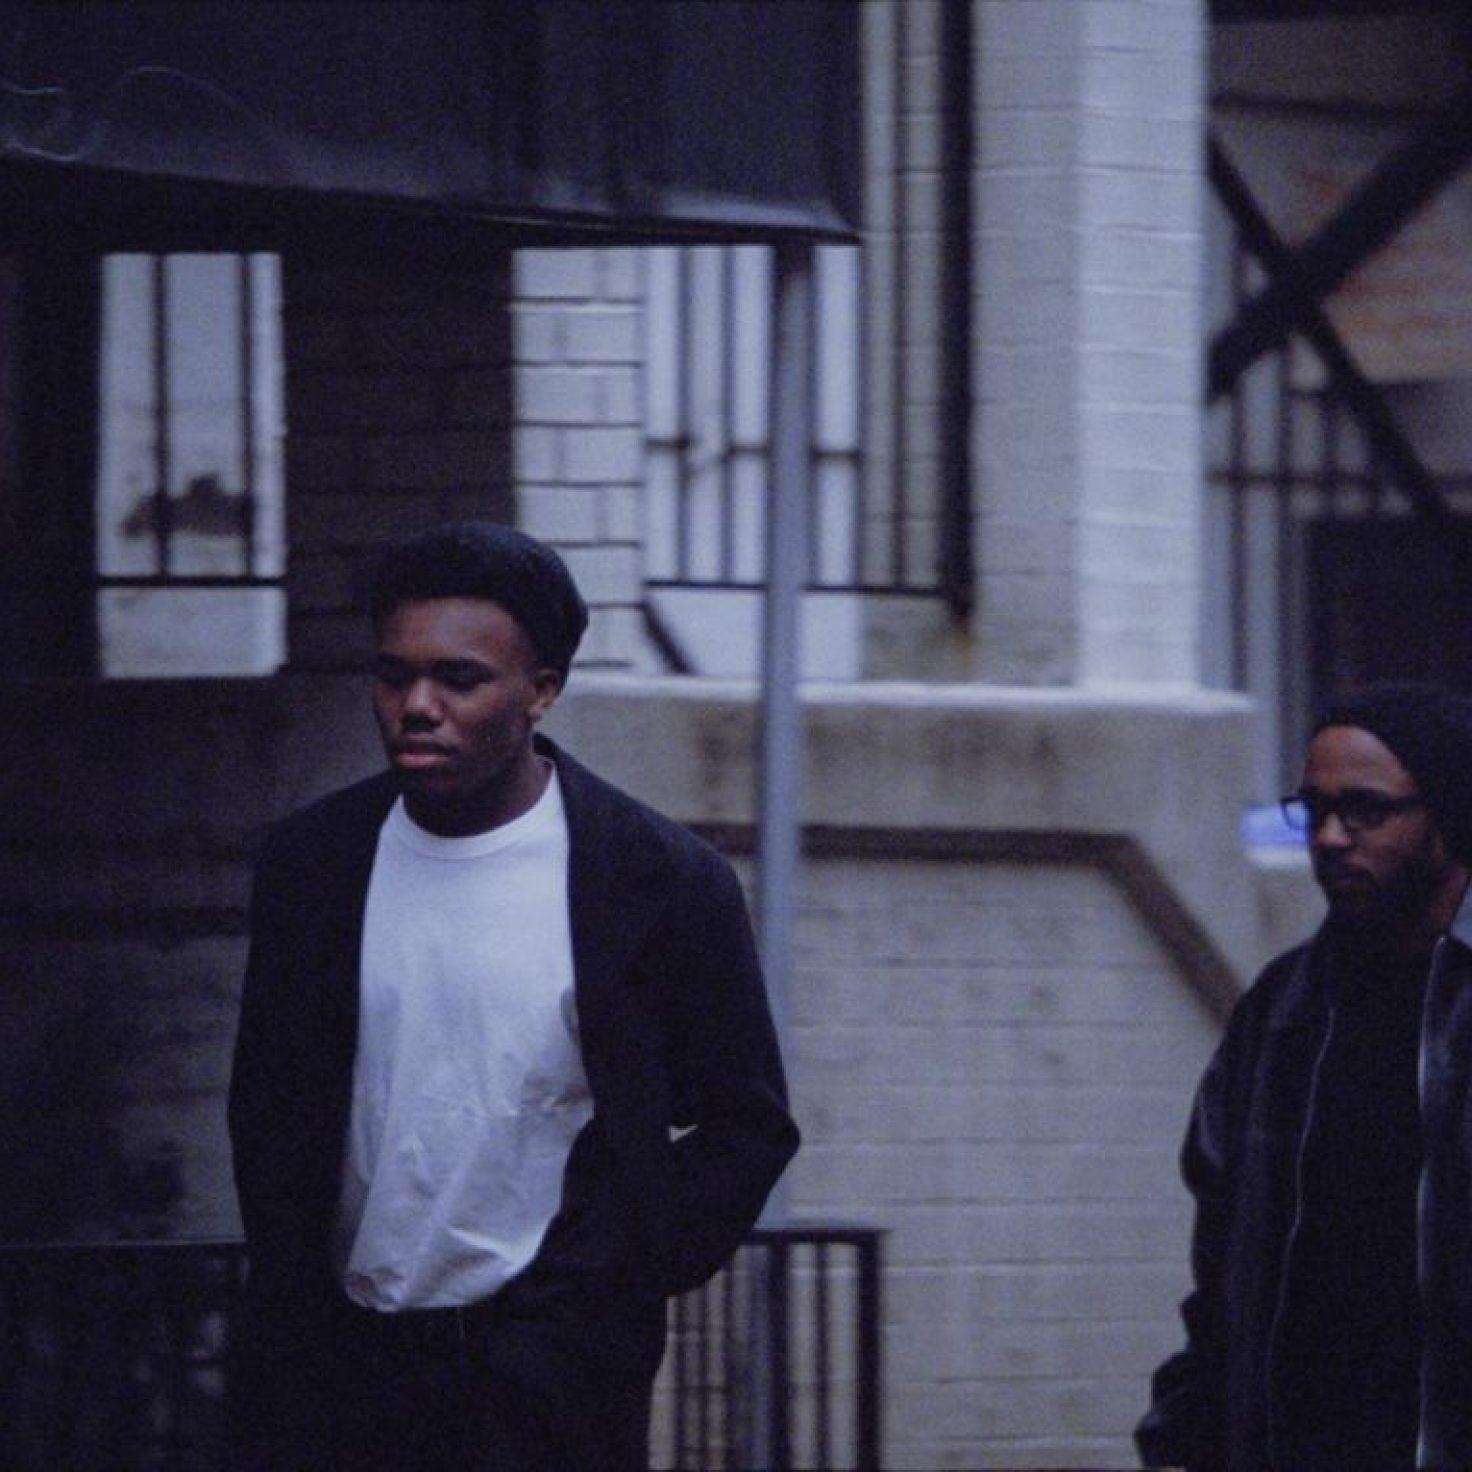 Kendrick Lamar And Dave Free Launch New Creative Company pgLang